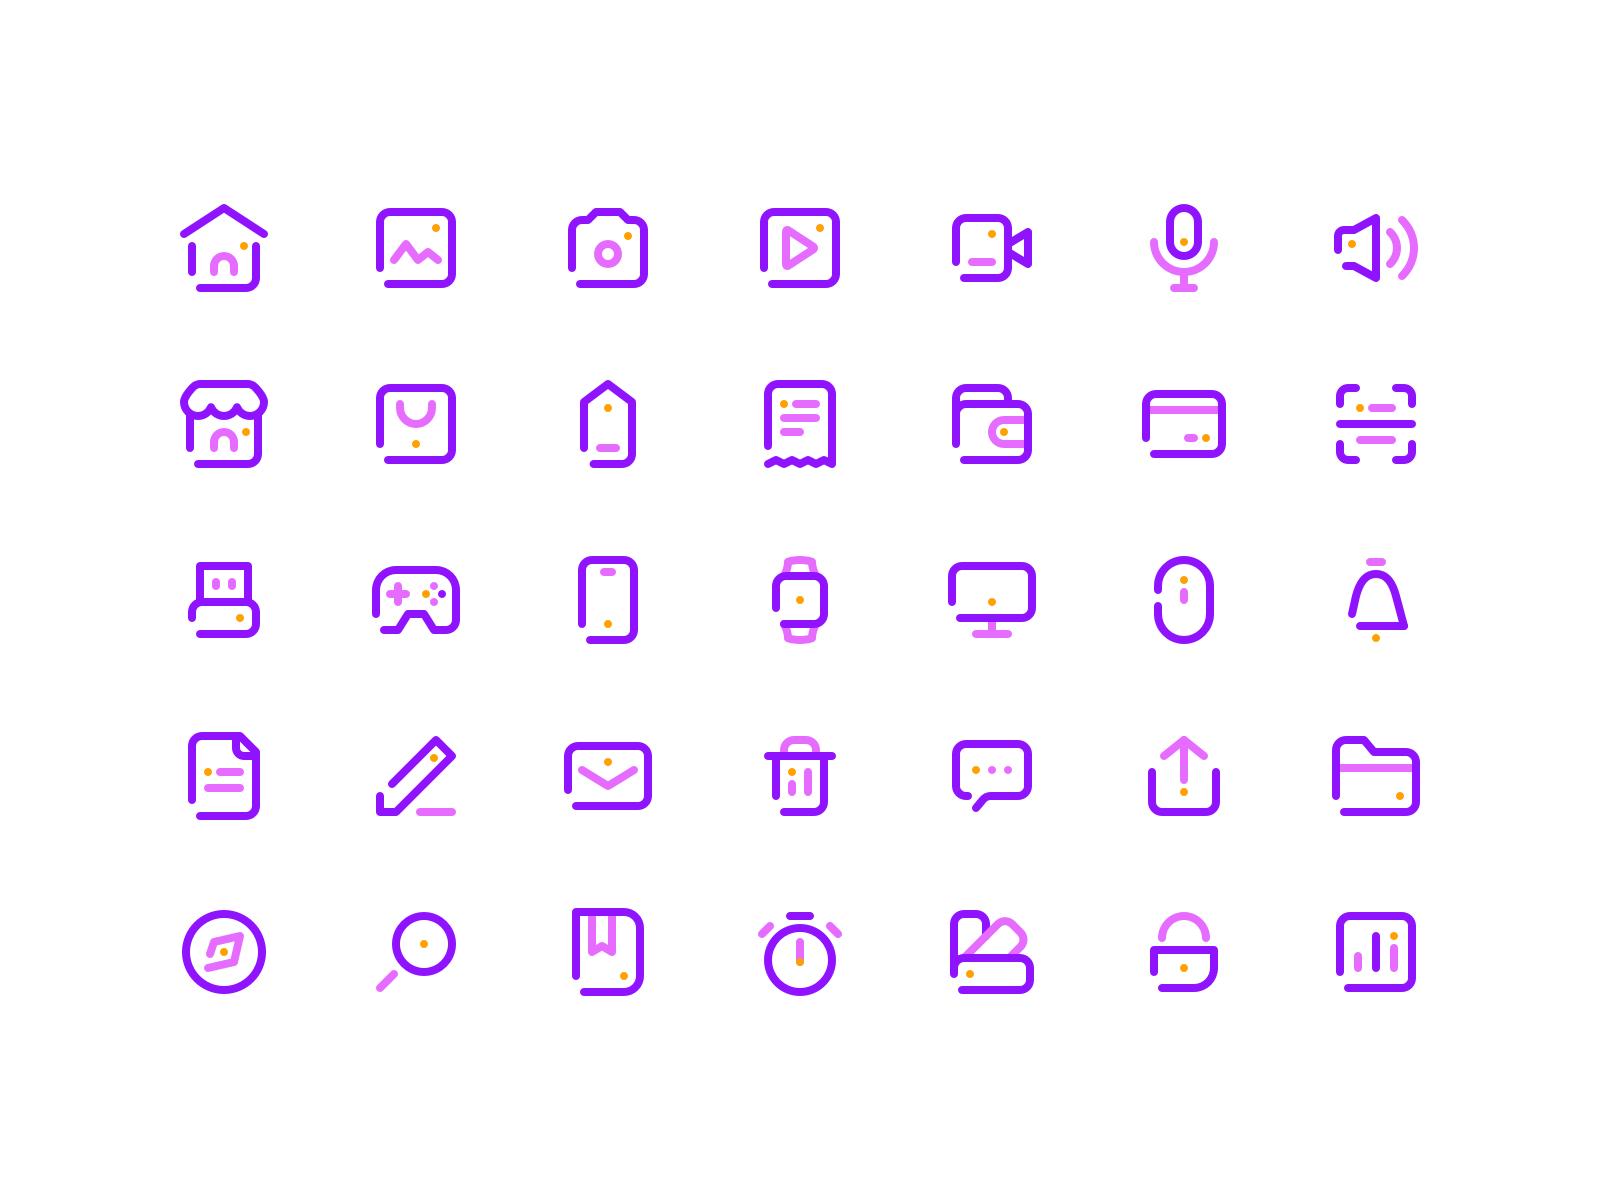 35个简洁图标ICON .sketch素材下载 图标-第1张